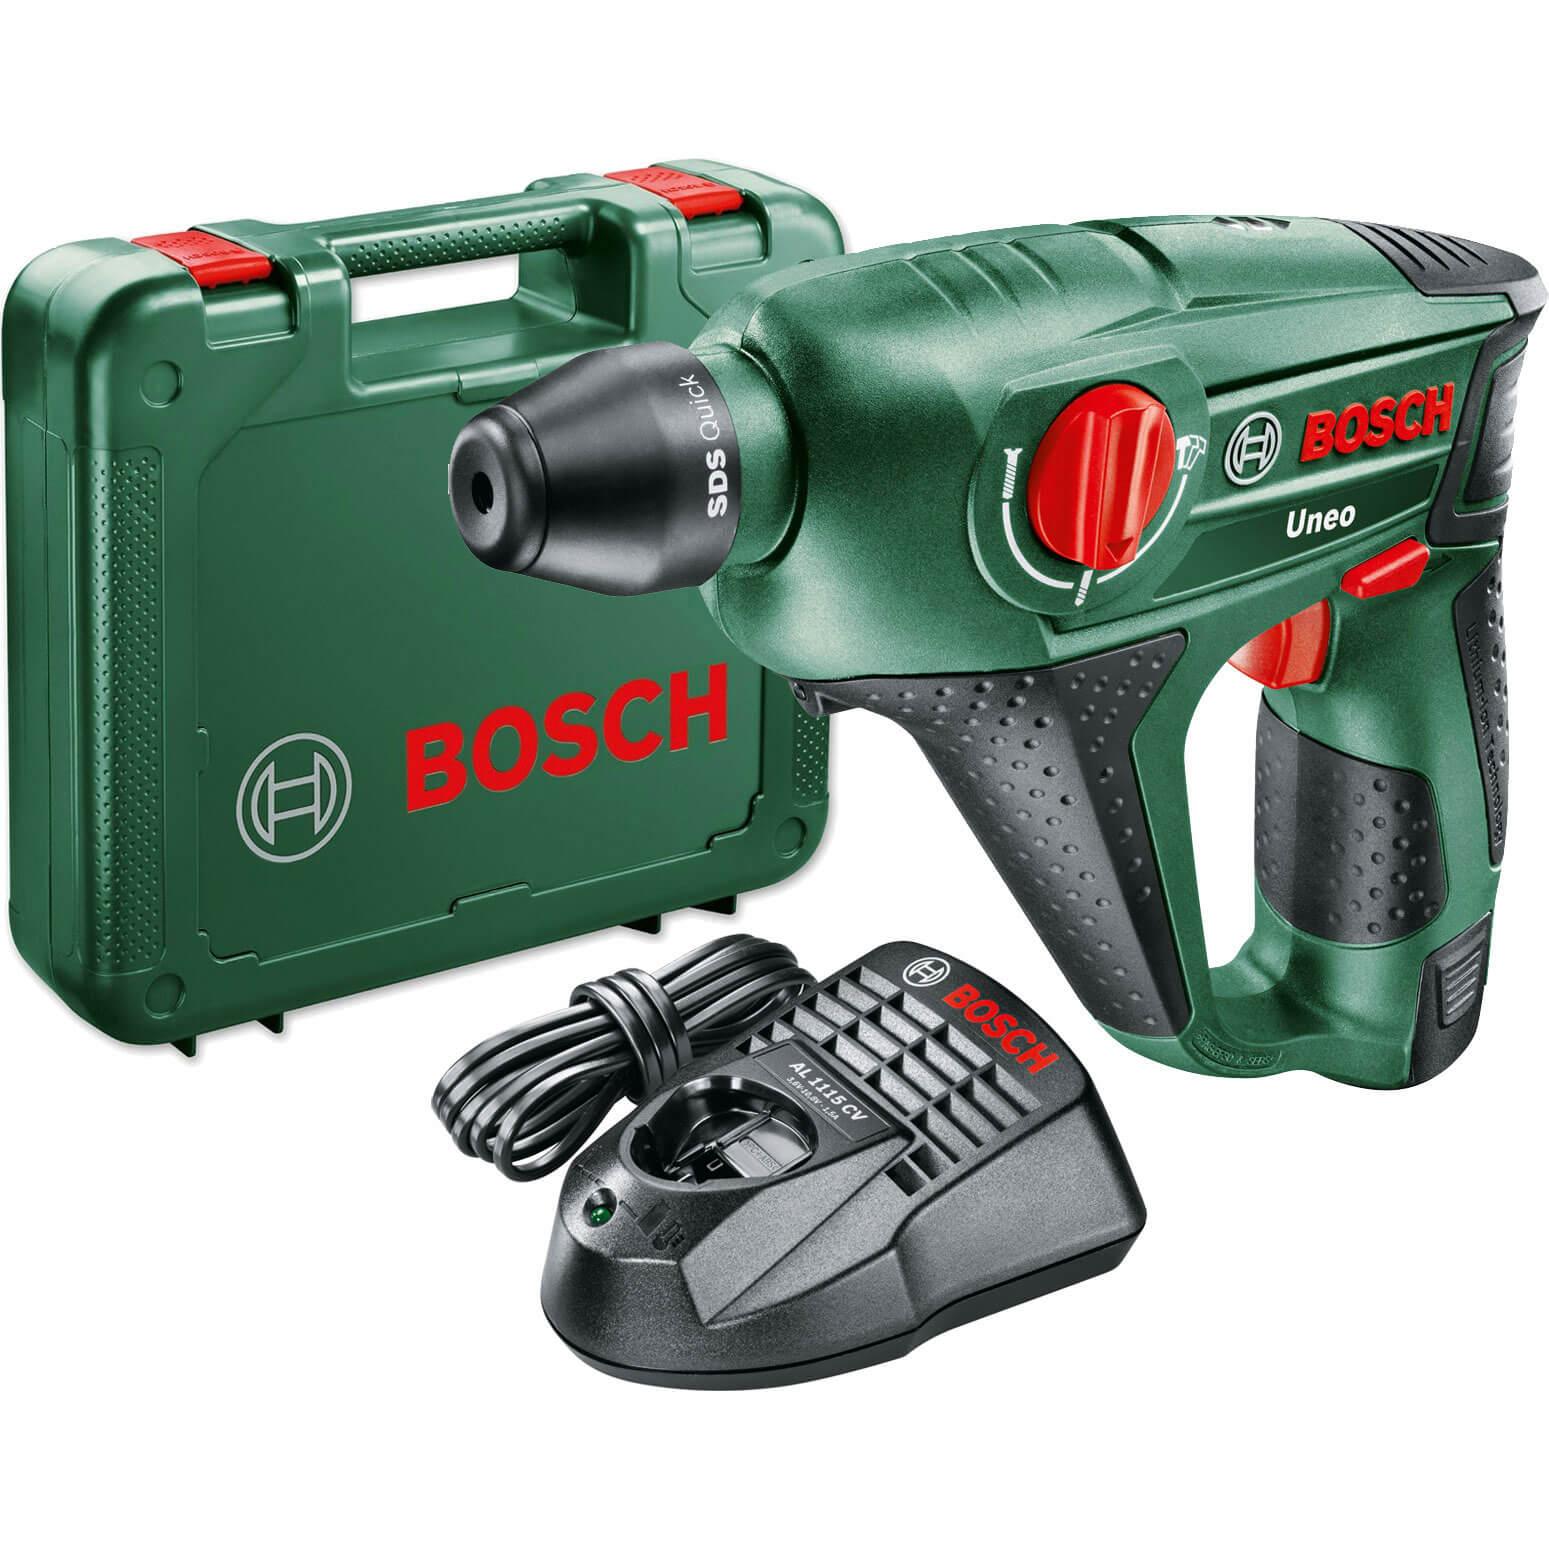 Bosch UNEO 10.8 LI2 10.8v Cordless Hammer Drill 1 x 2ah Liion Charger Case